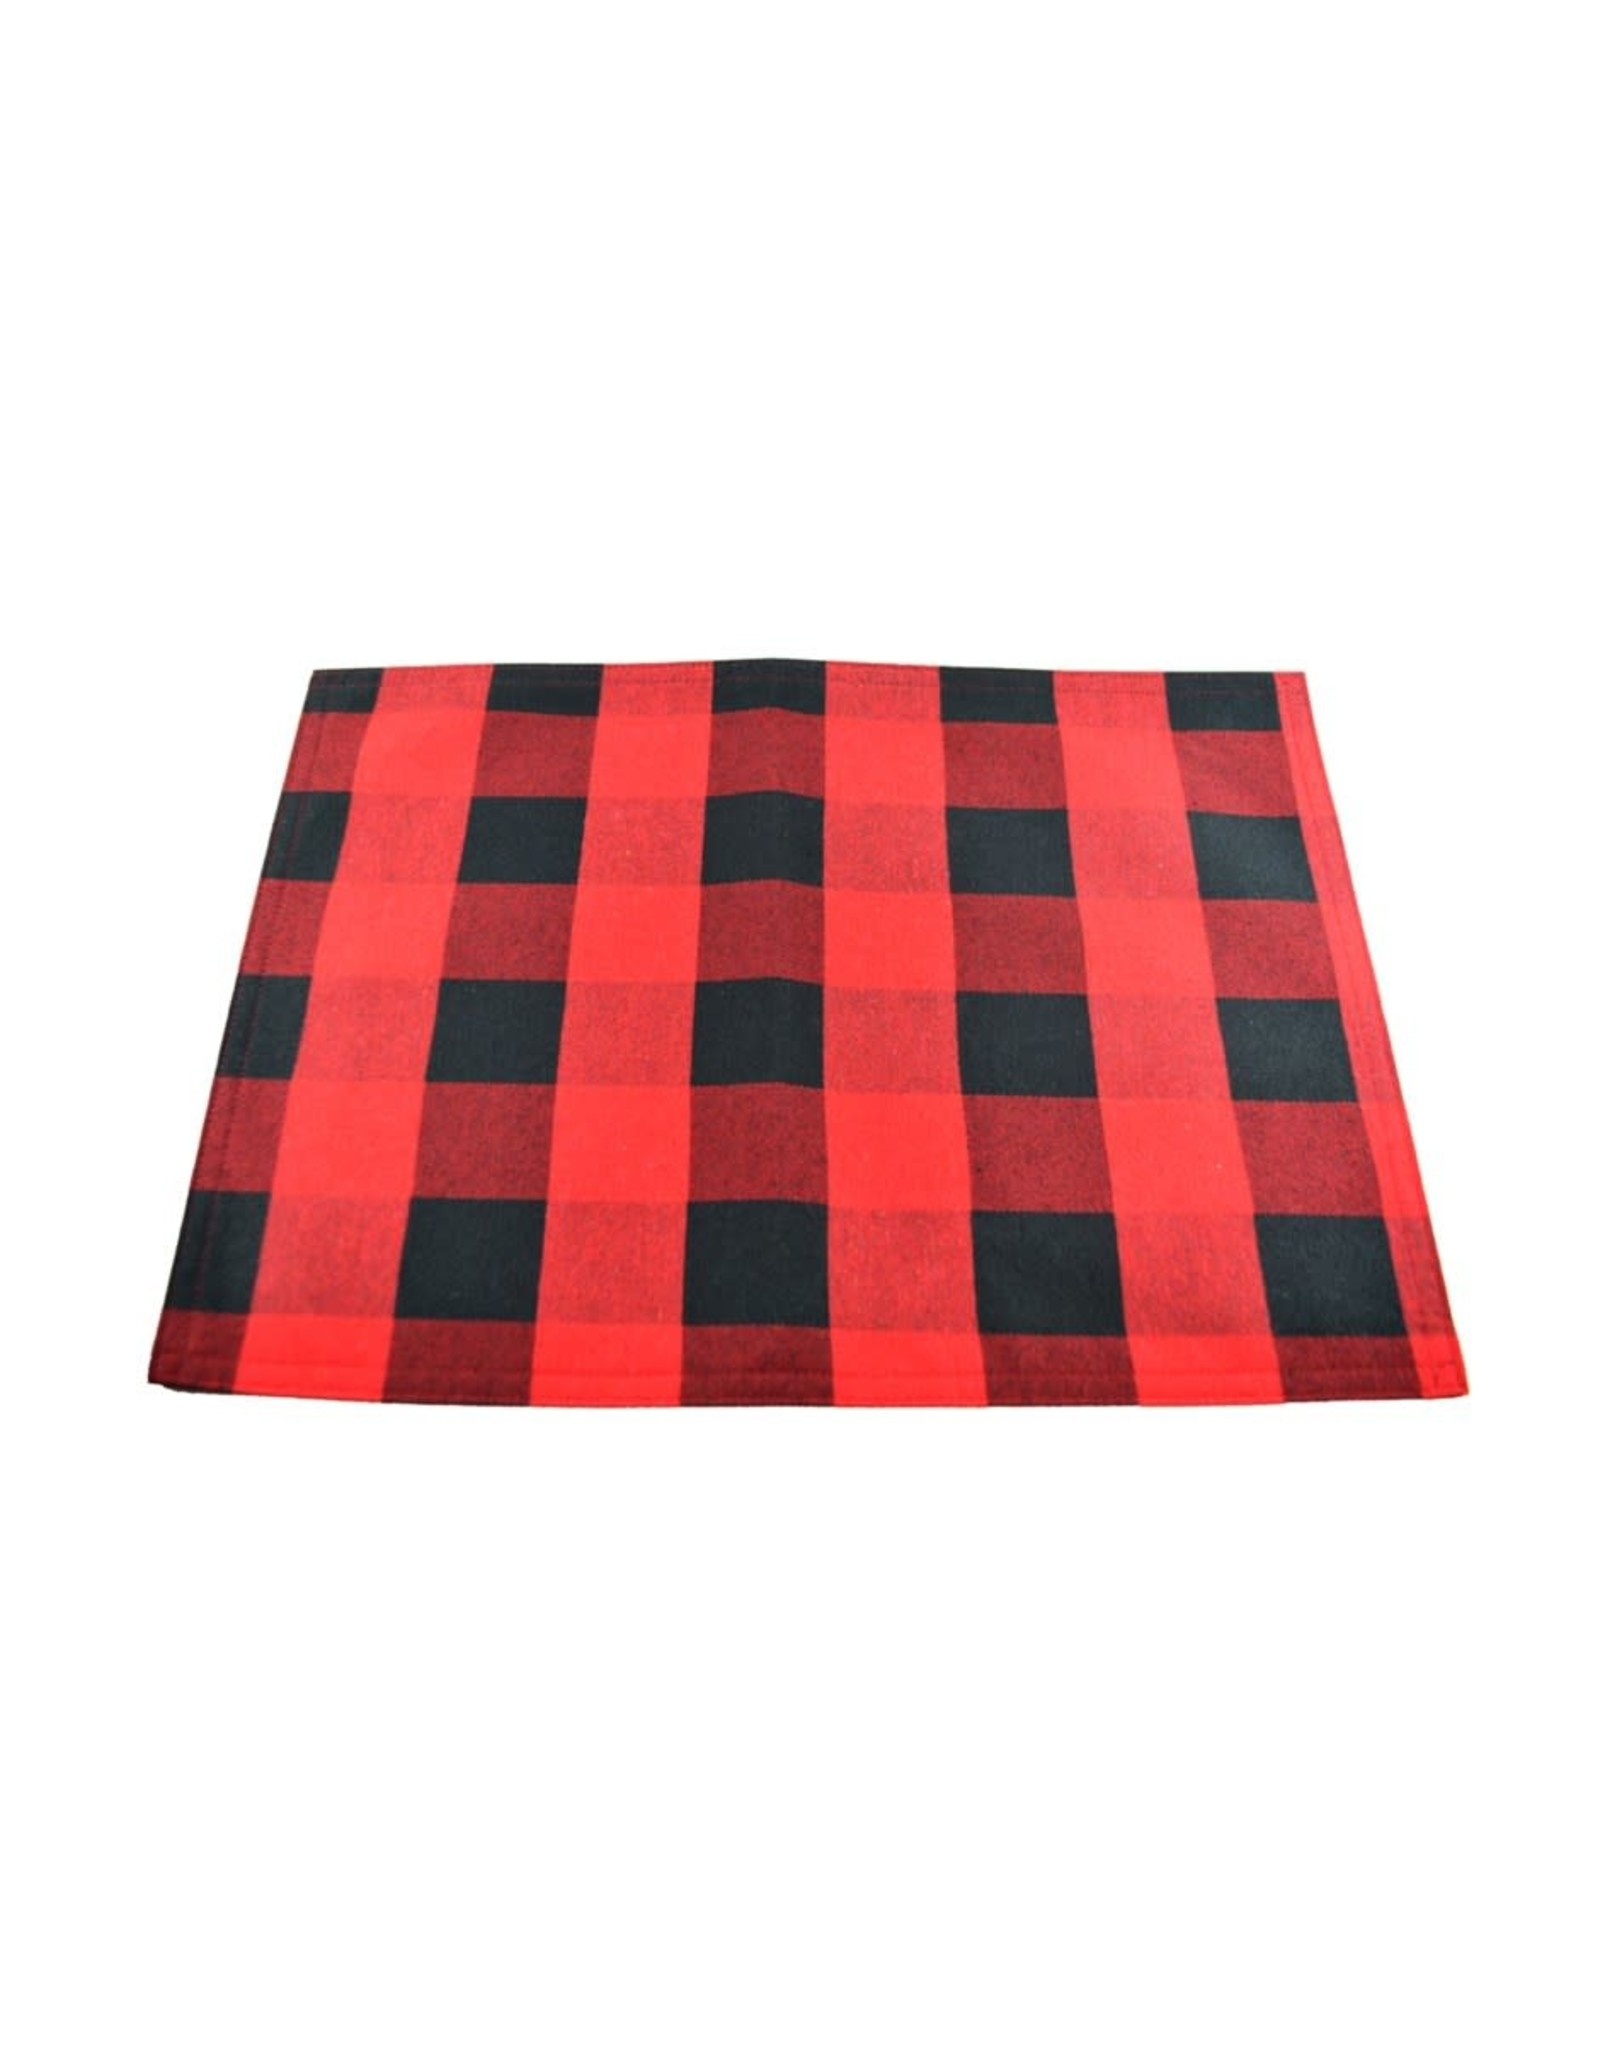 Napperons rouge et noir (Lumberjack)